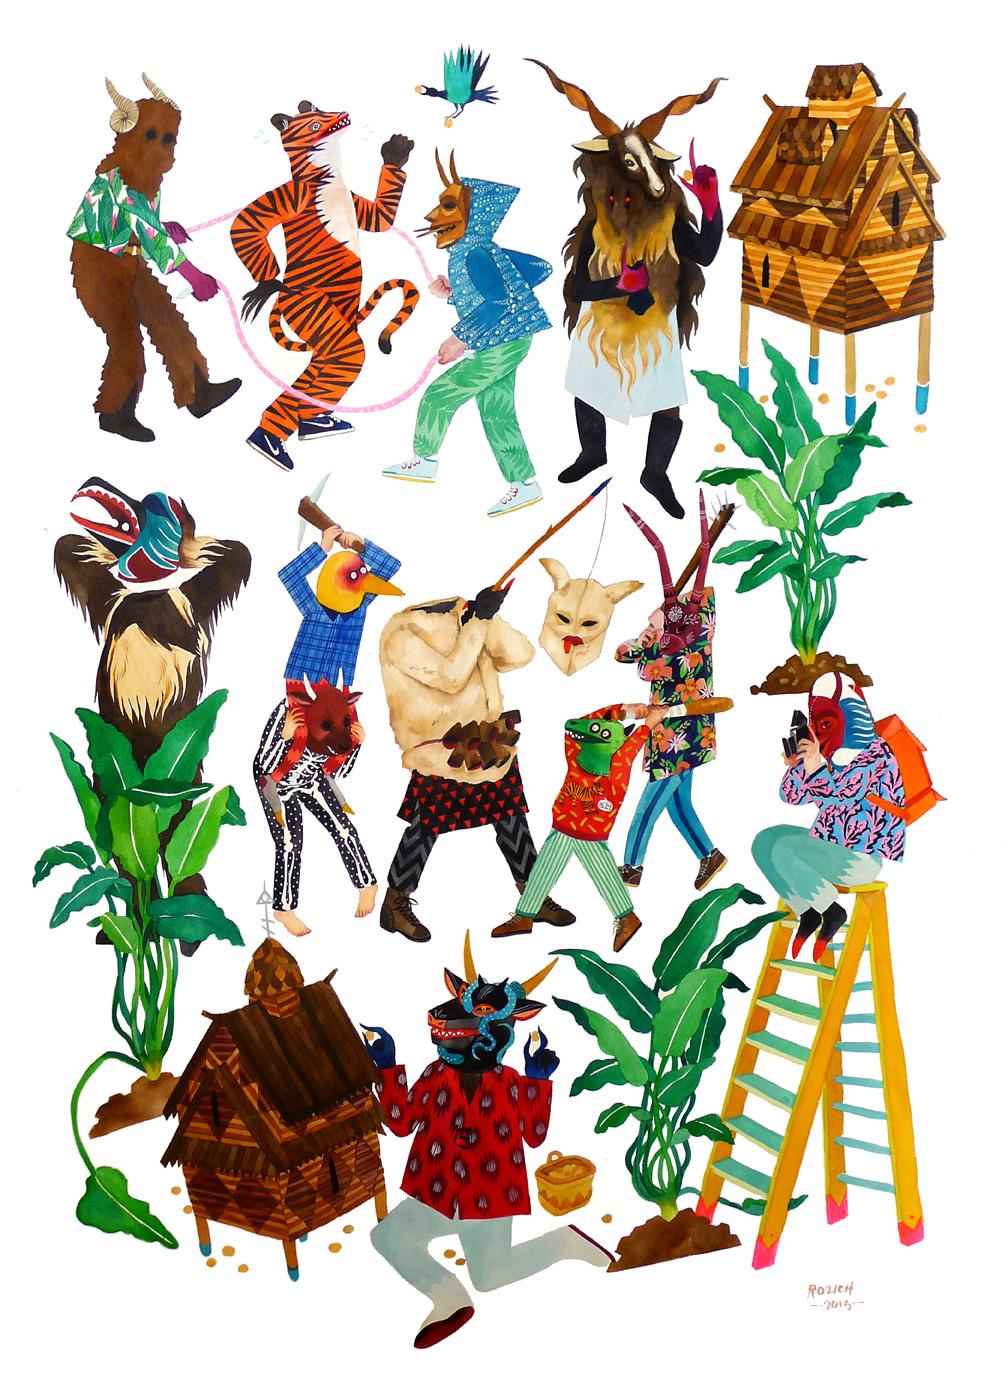 stacey rozich illustration 4-1